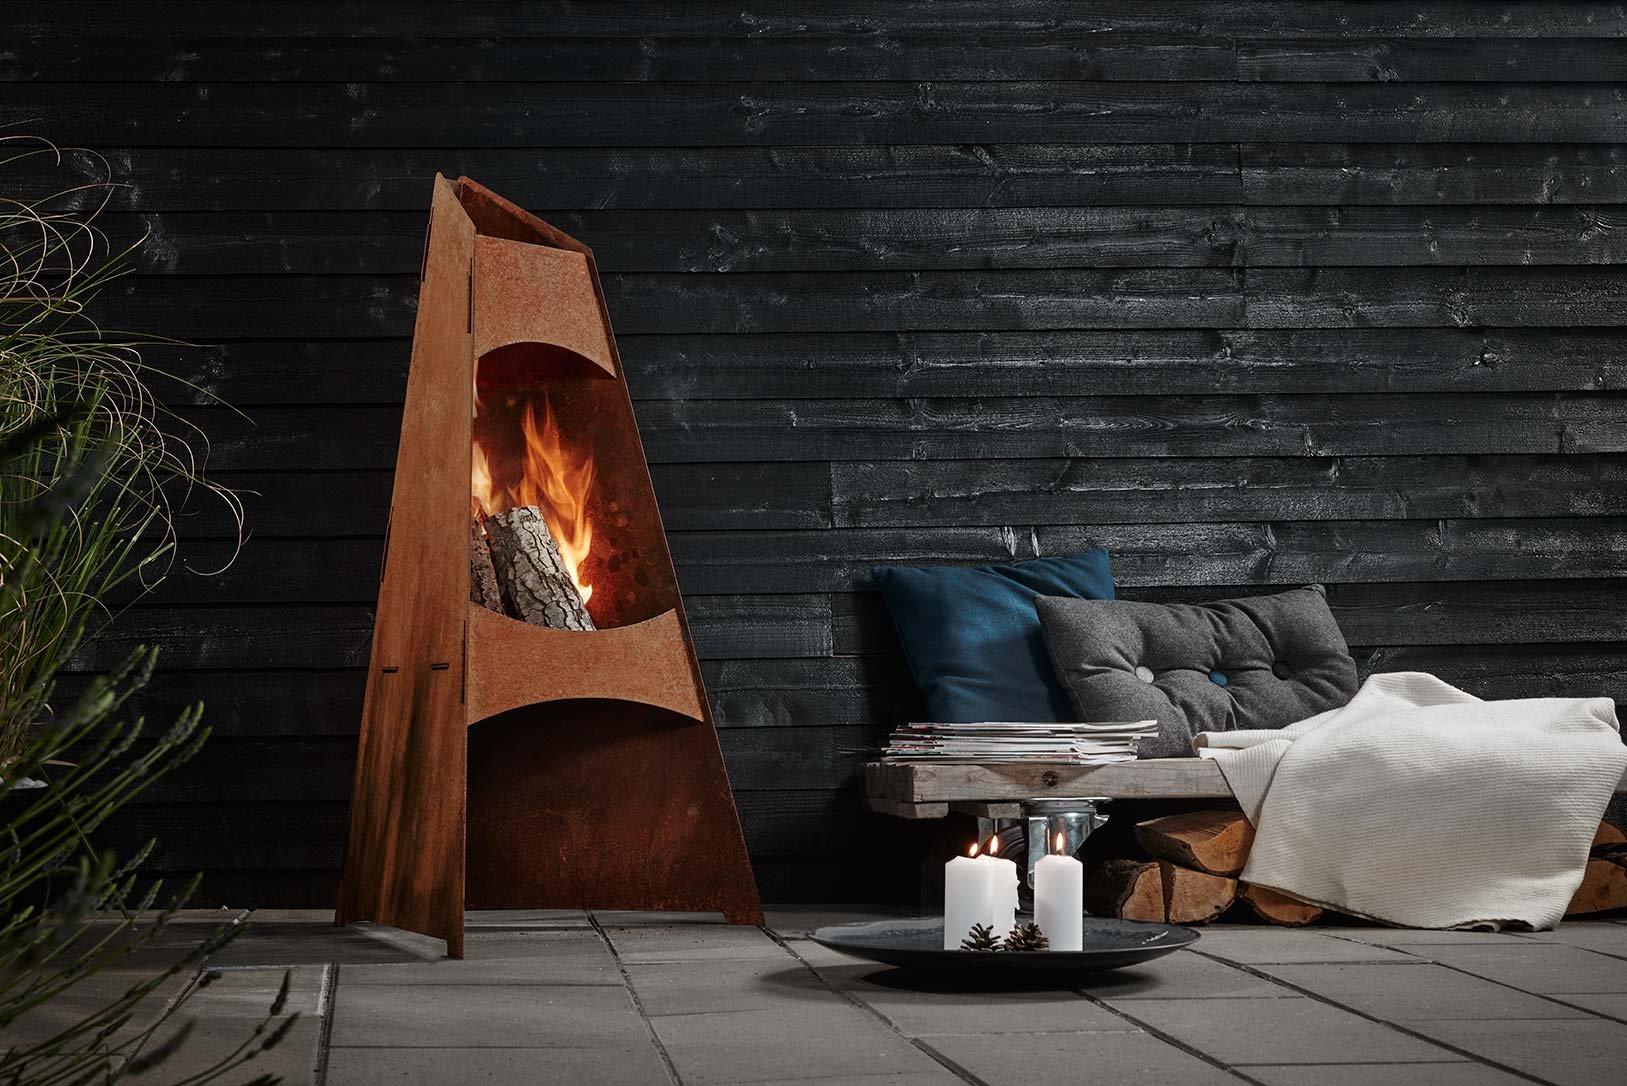 Chimenea de jardín | acero corten | brasero | calentador de Patio jardín chimenea | Redwood Denmark: Amazon.es: Jardín